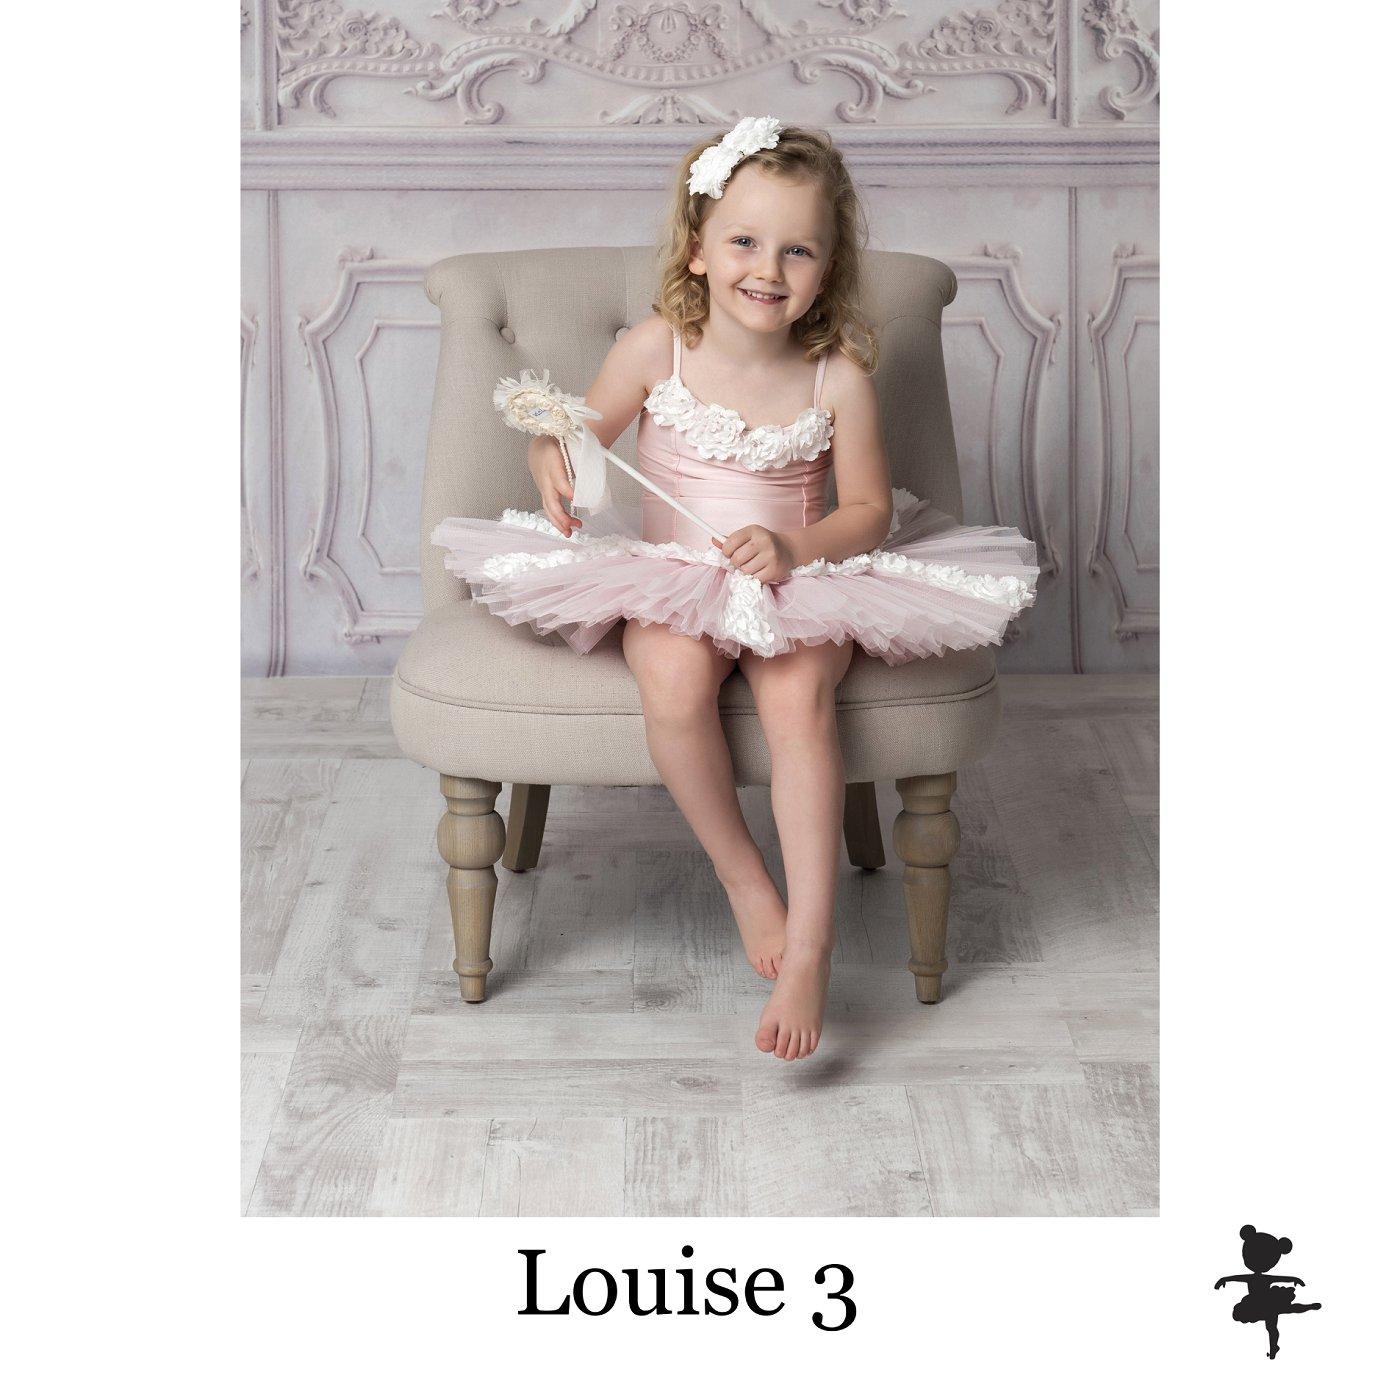 LB0119-Louise 3.jpg